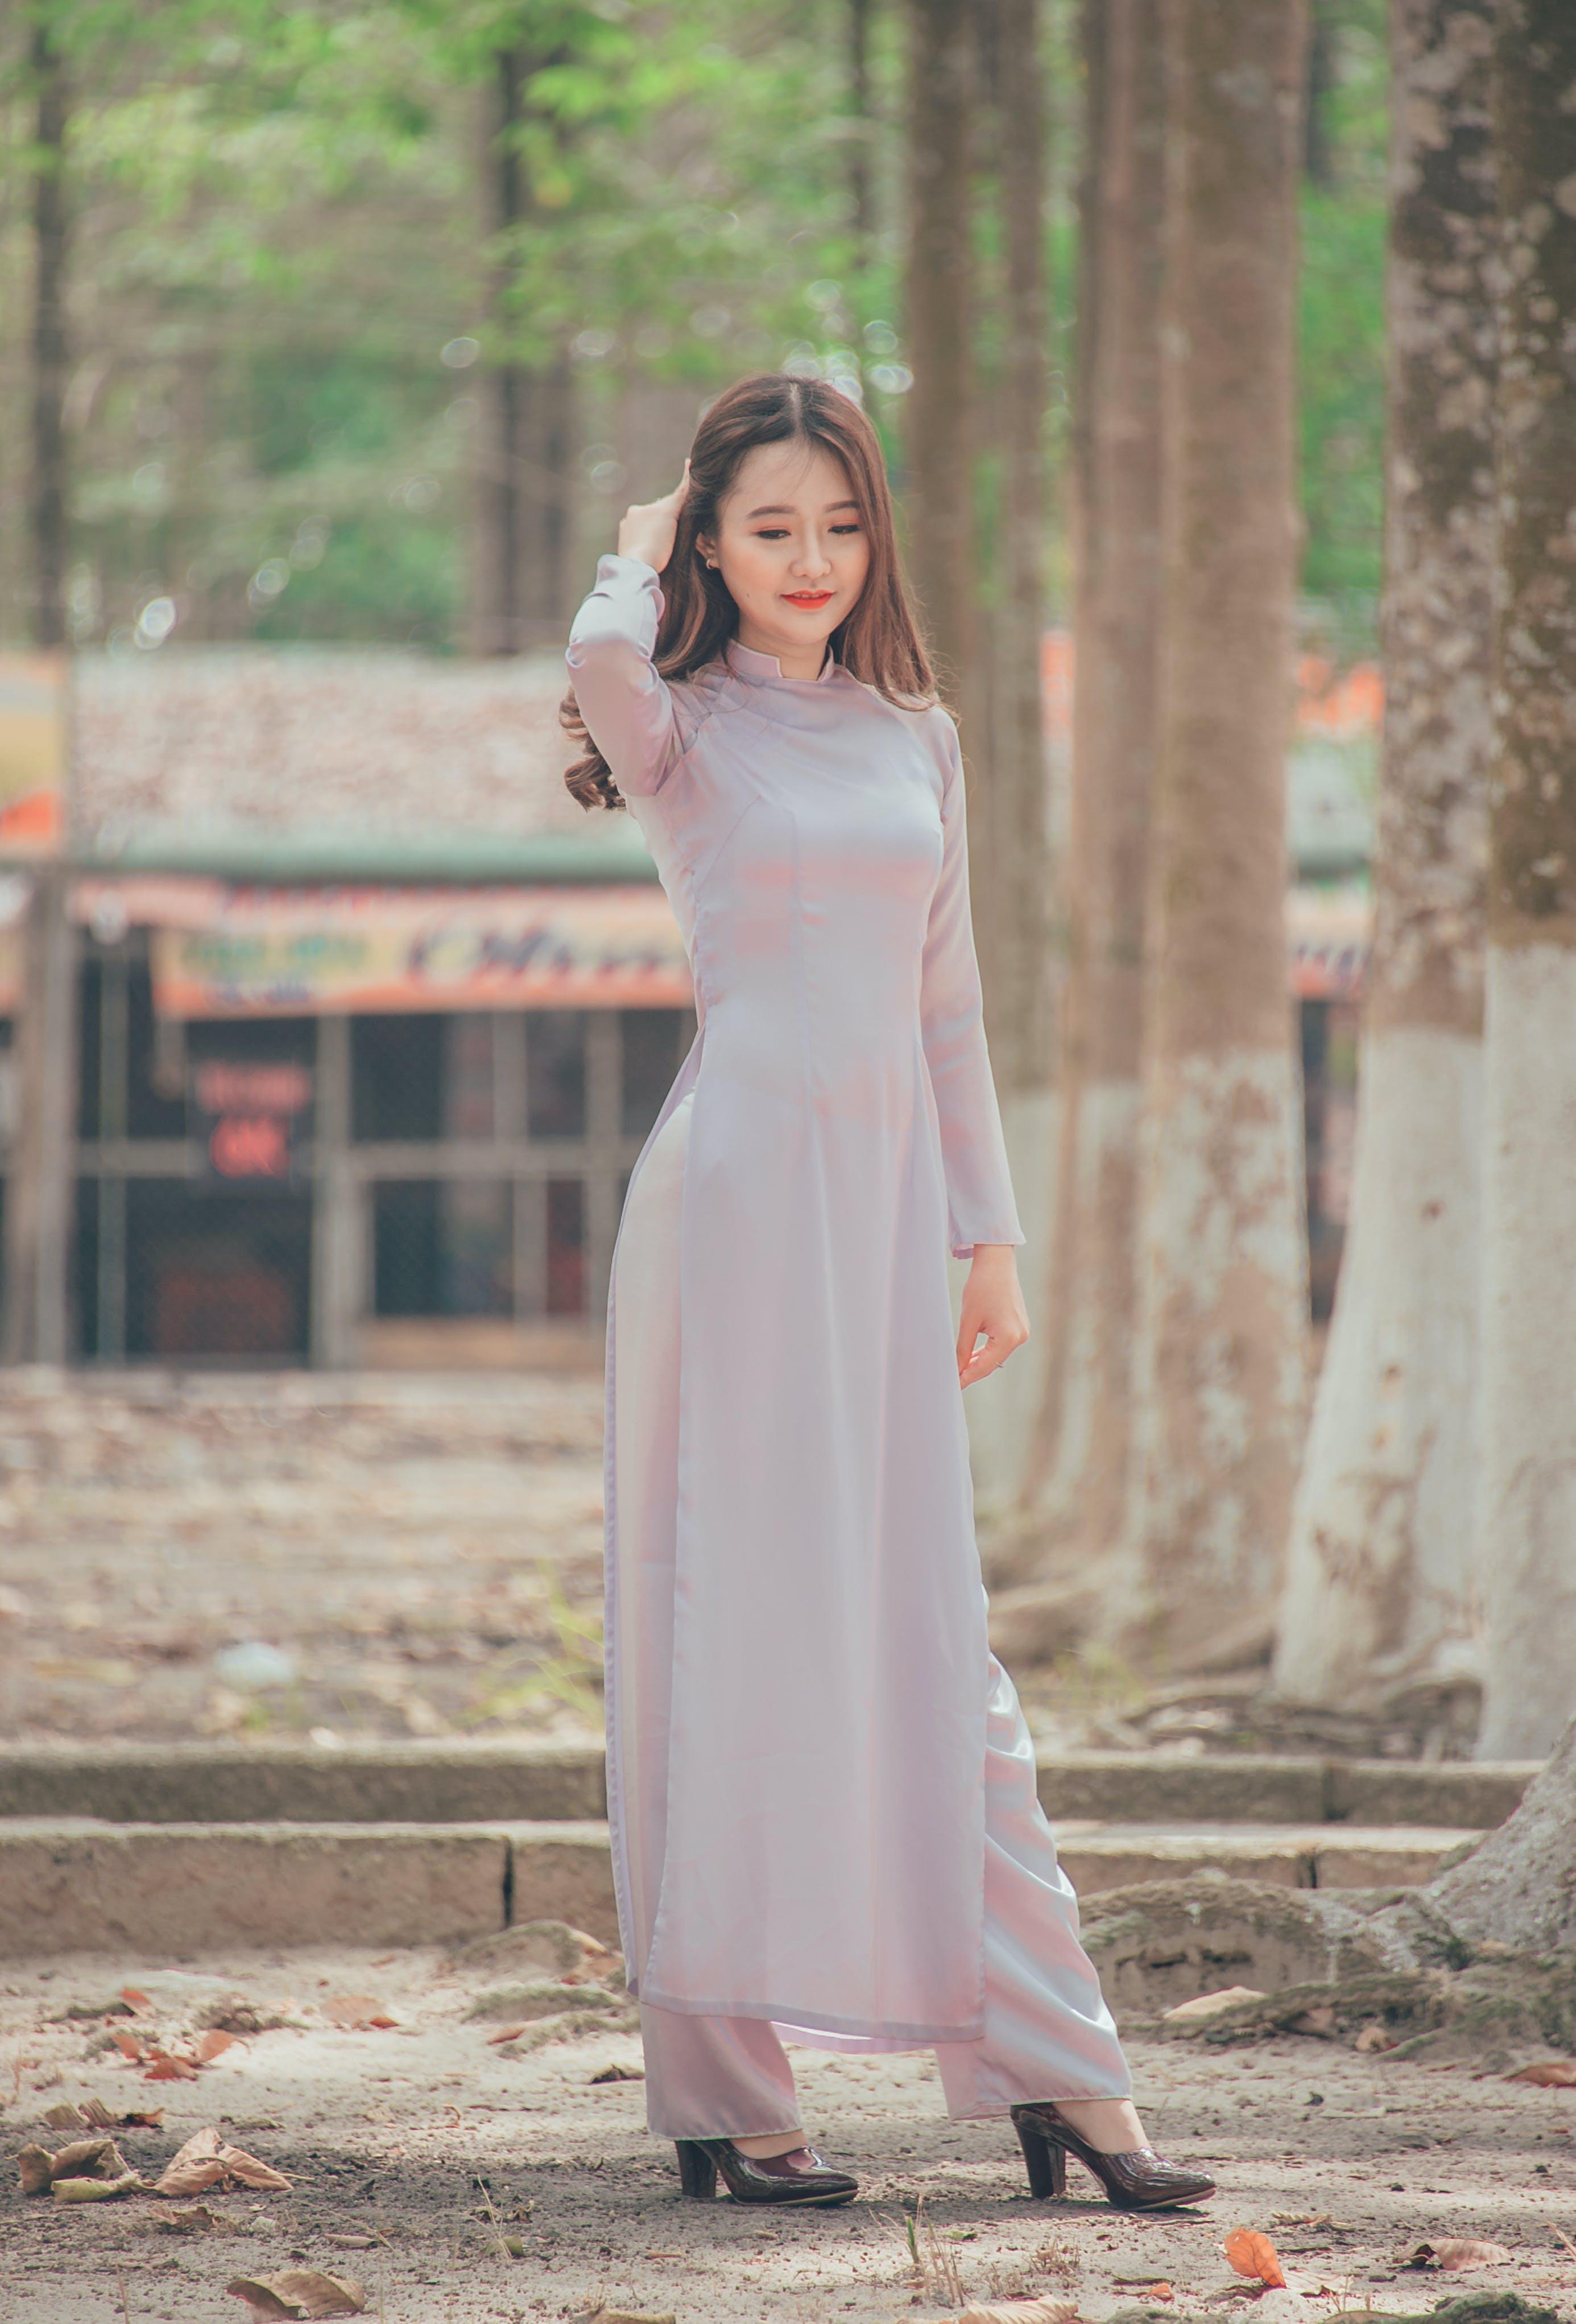 Photo of Woman Wearing Long Dress